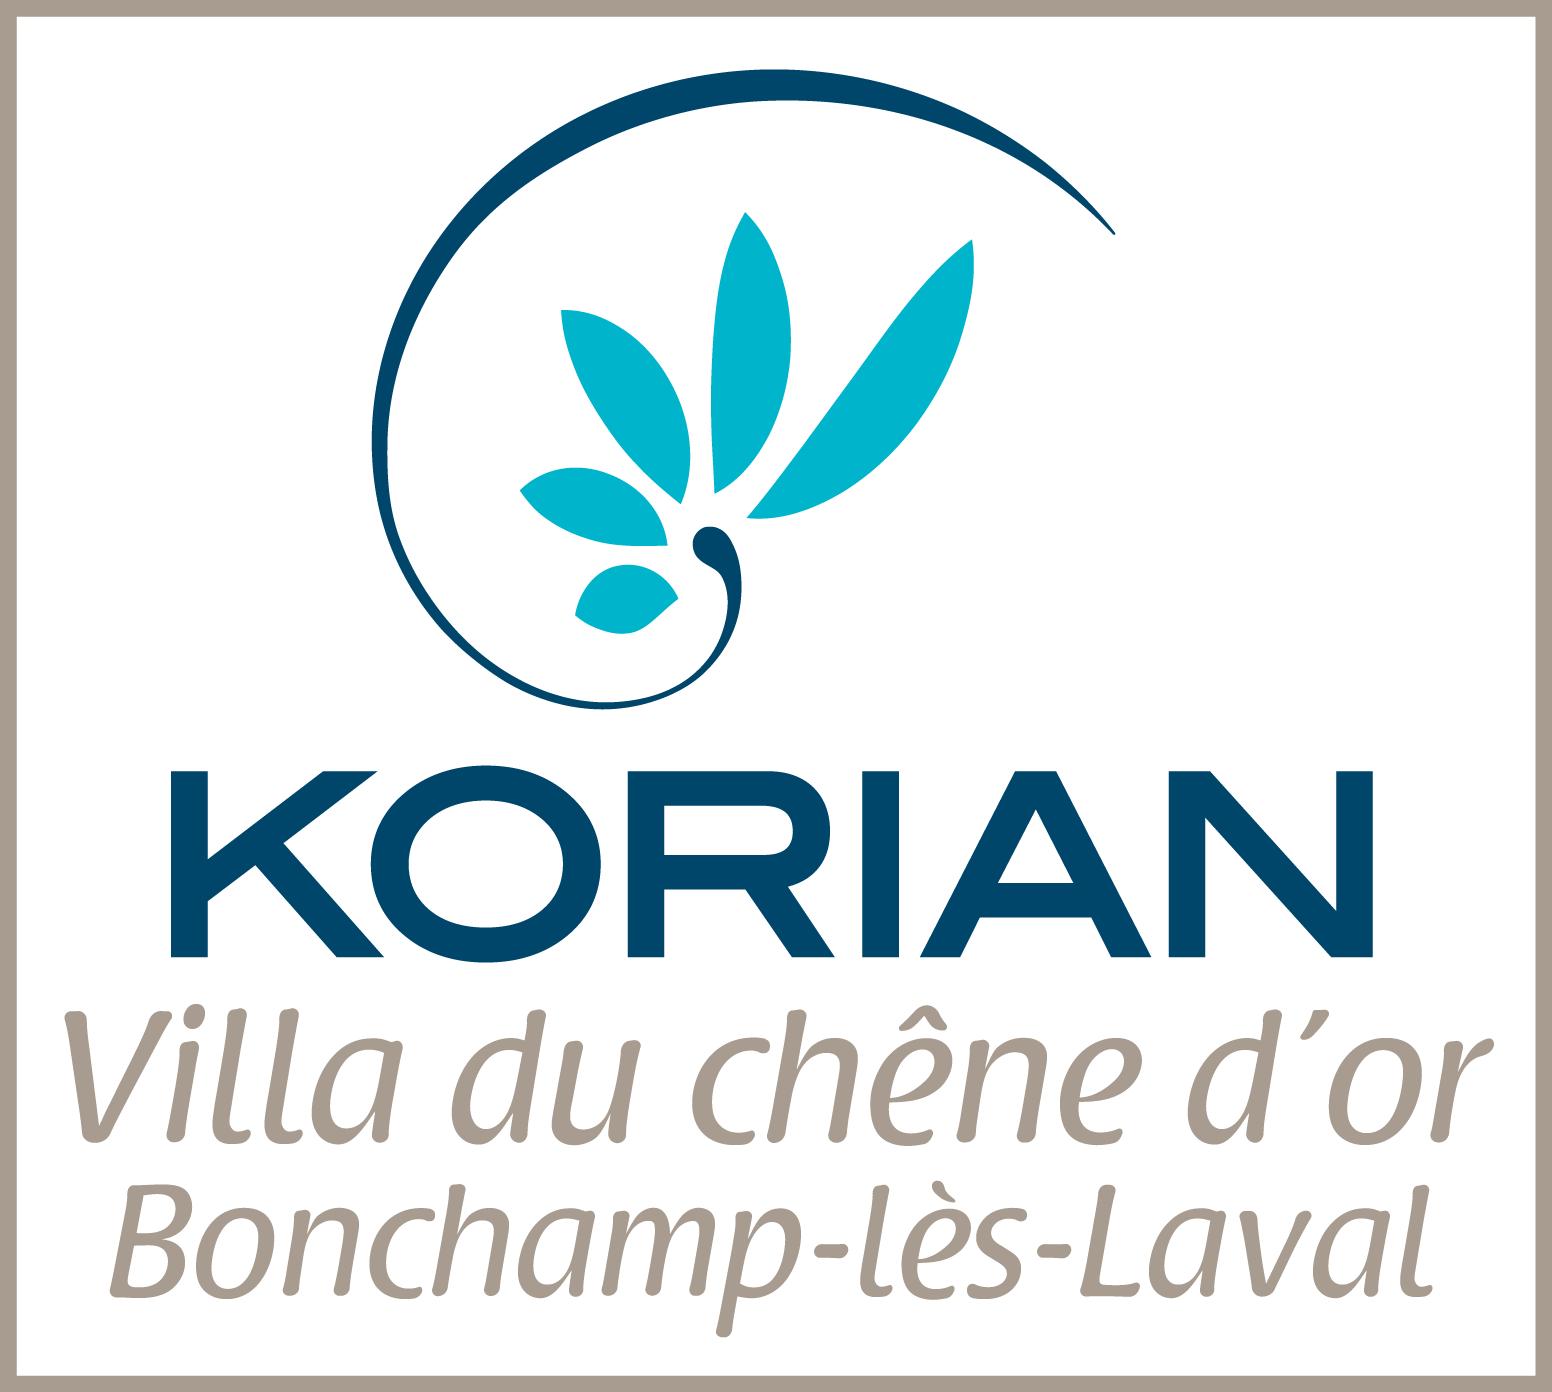 KORIAN_Villa du chene_d_or_cmjn